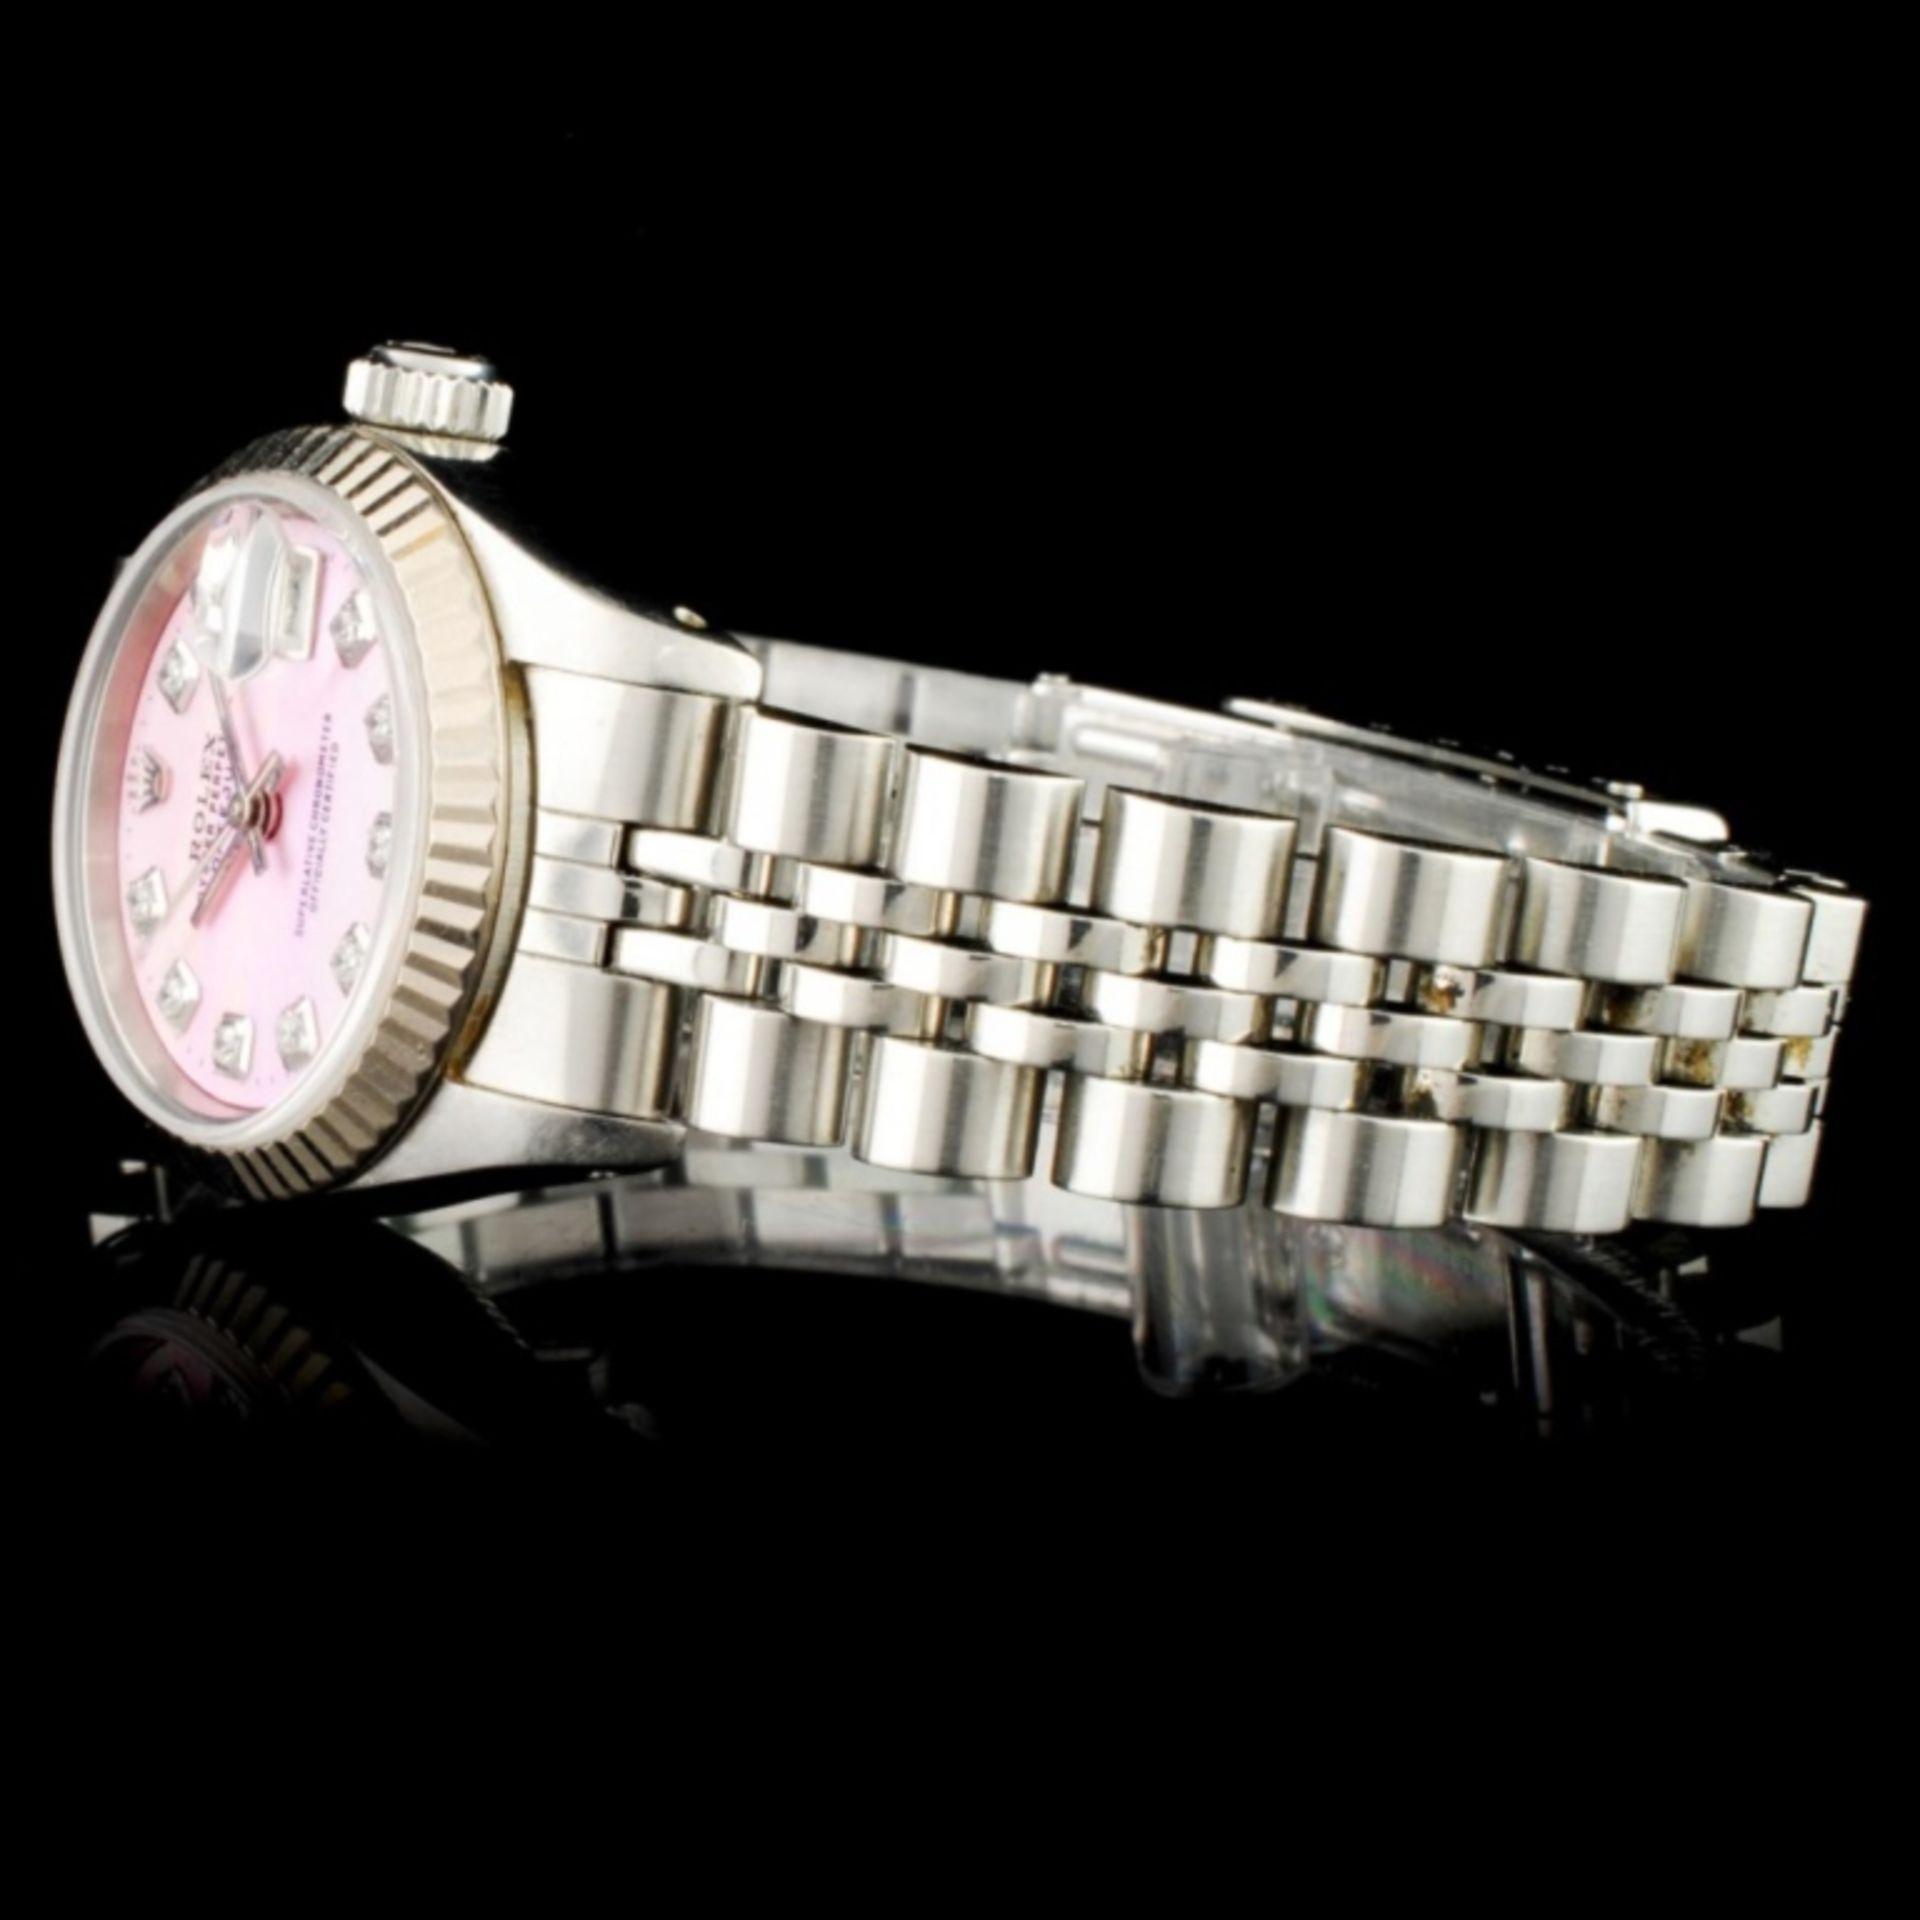 Rolex DateJust 18K & SS Ladies Wristwatch - Image 3 of 6